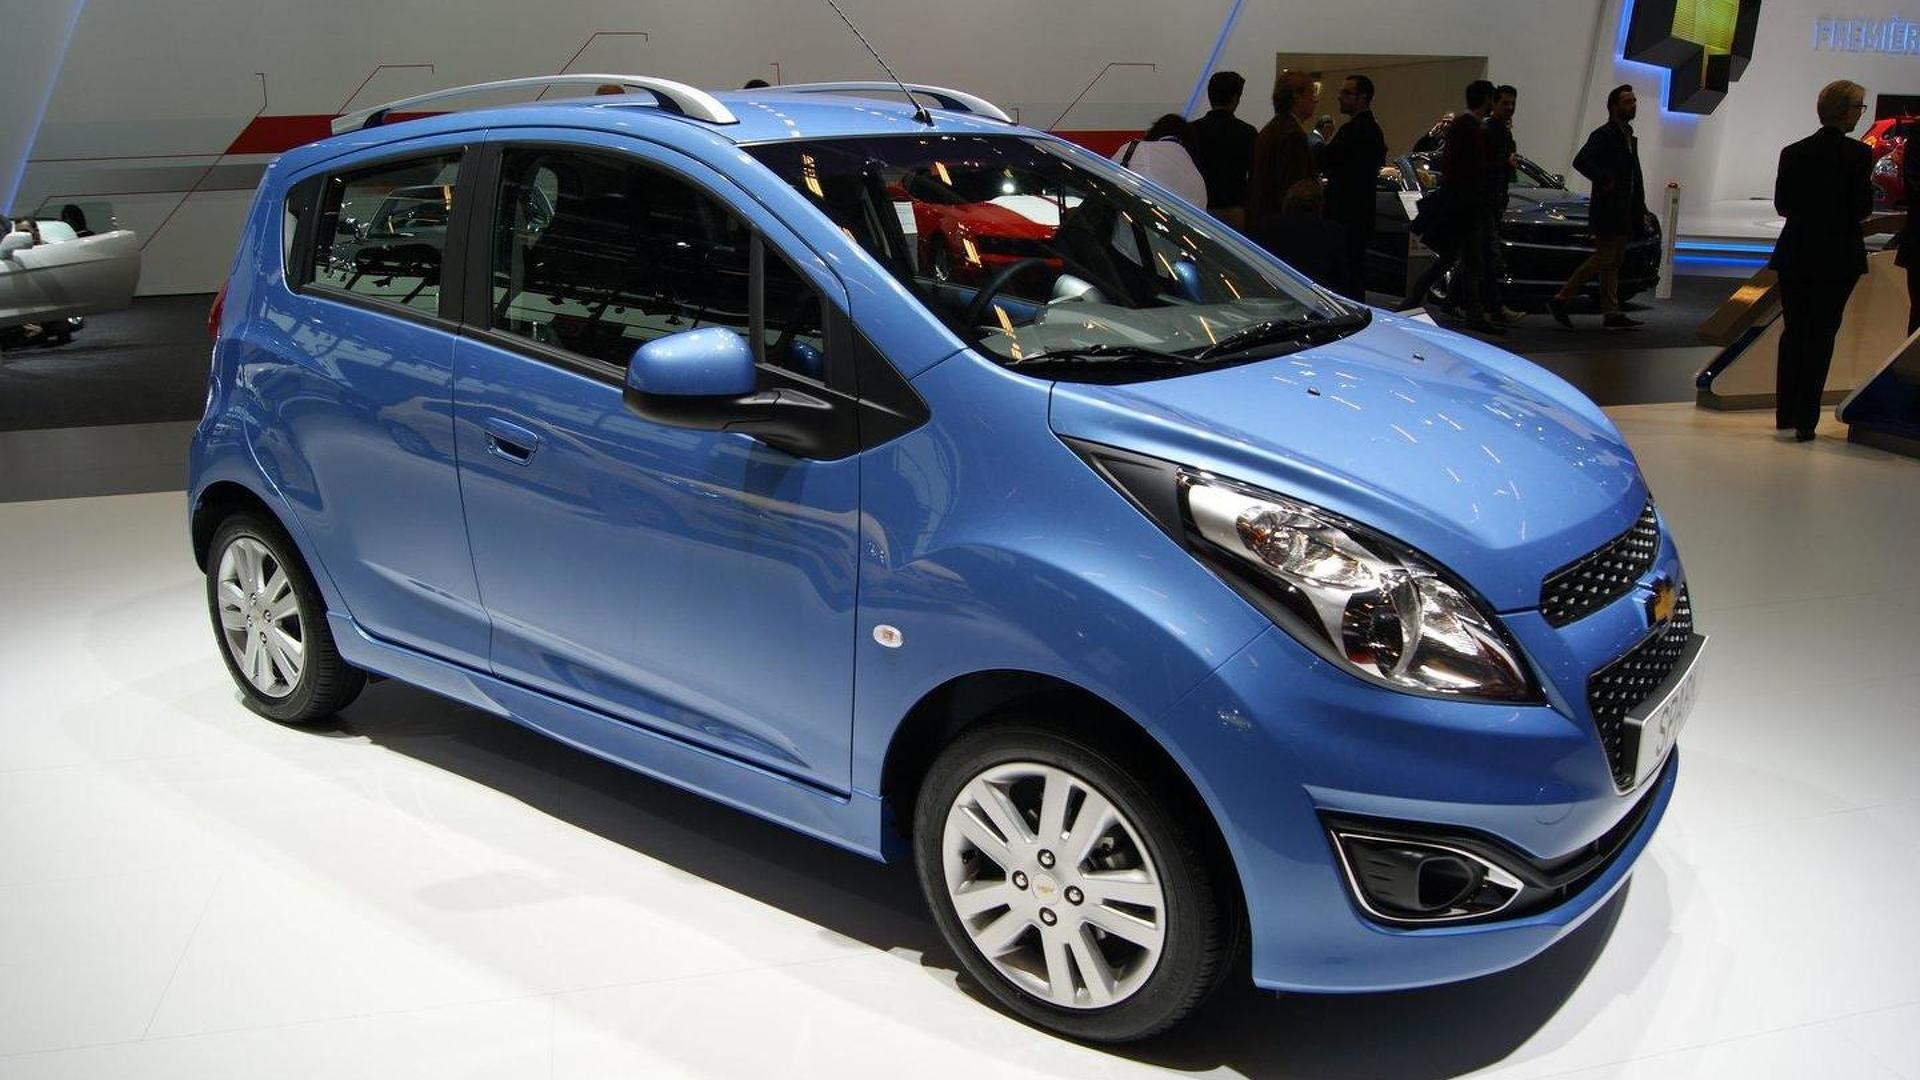 2013 Chevrolet Spark facelift & Orlando Turbo debut in Paris